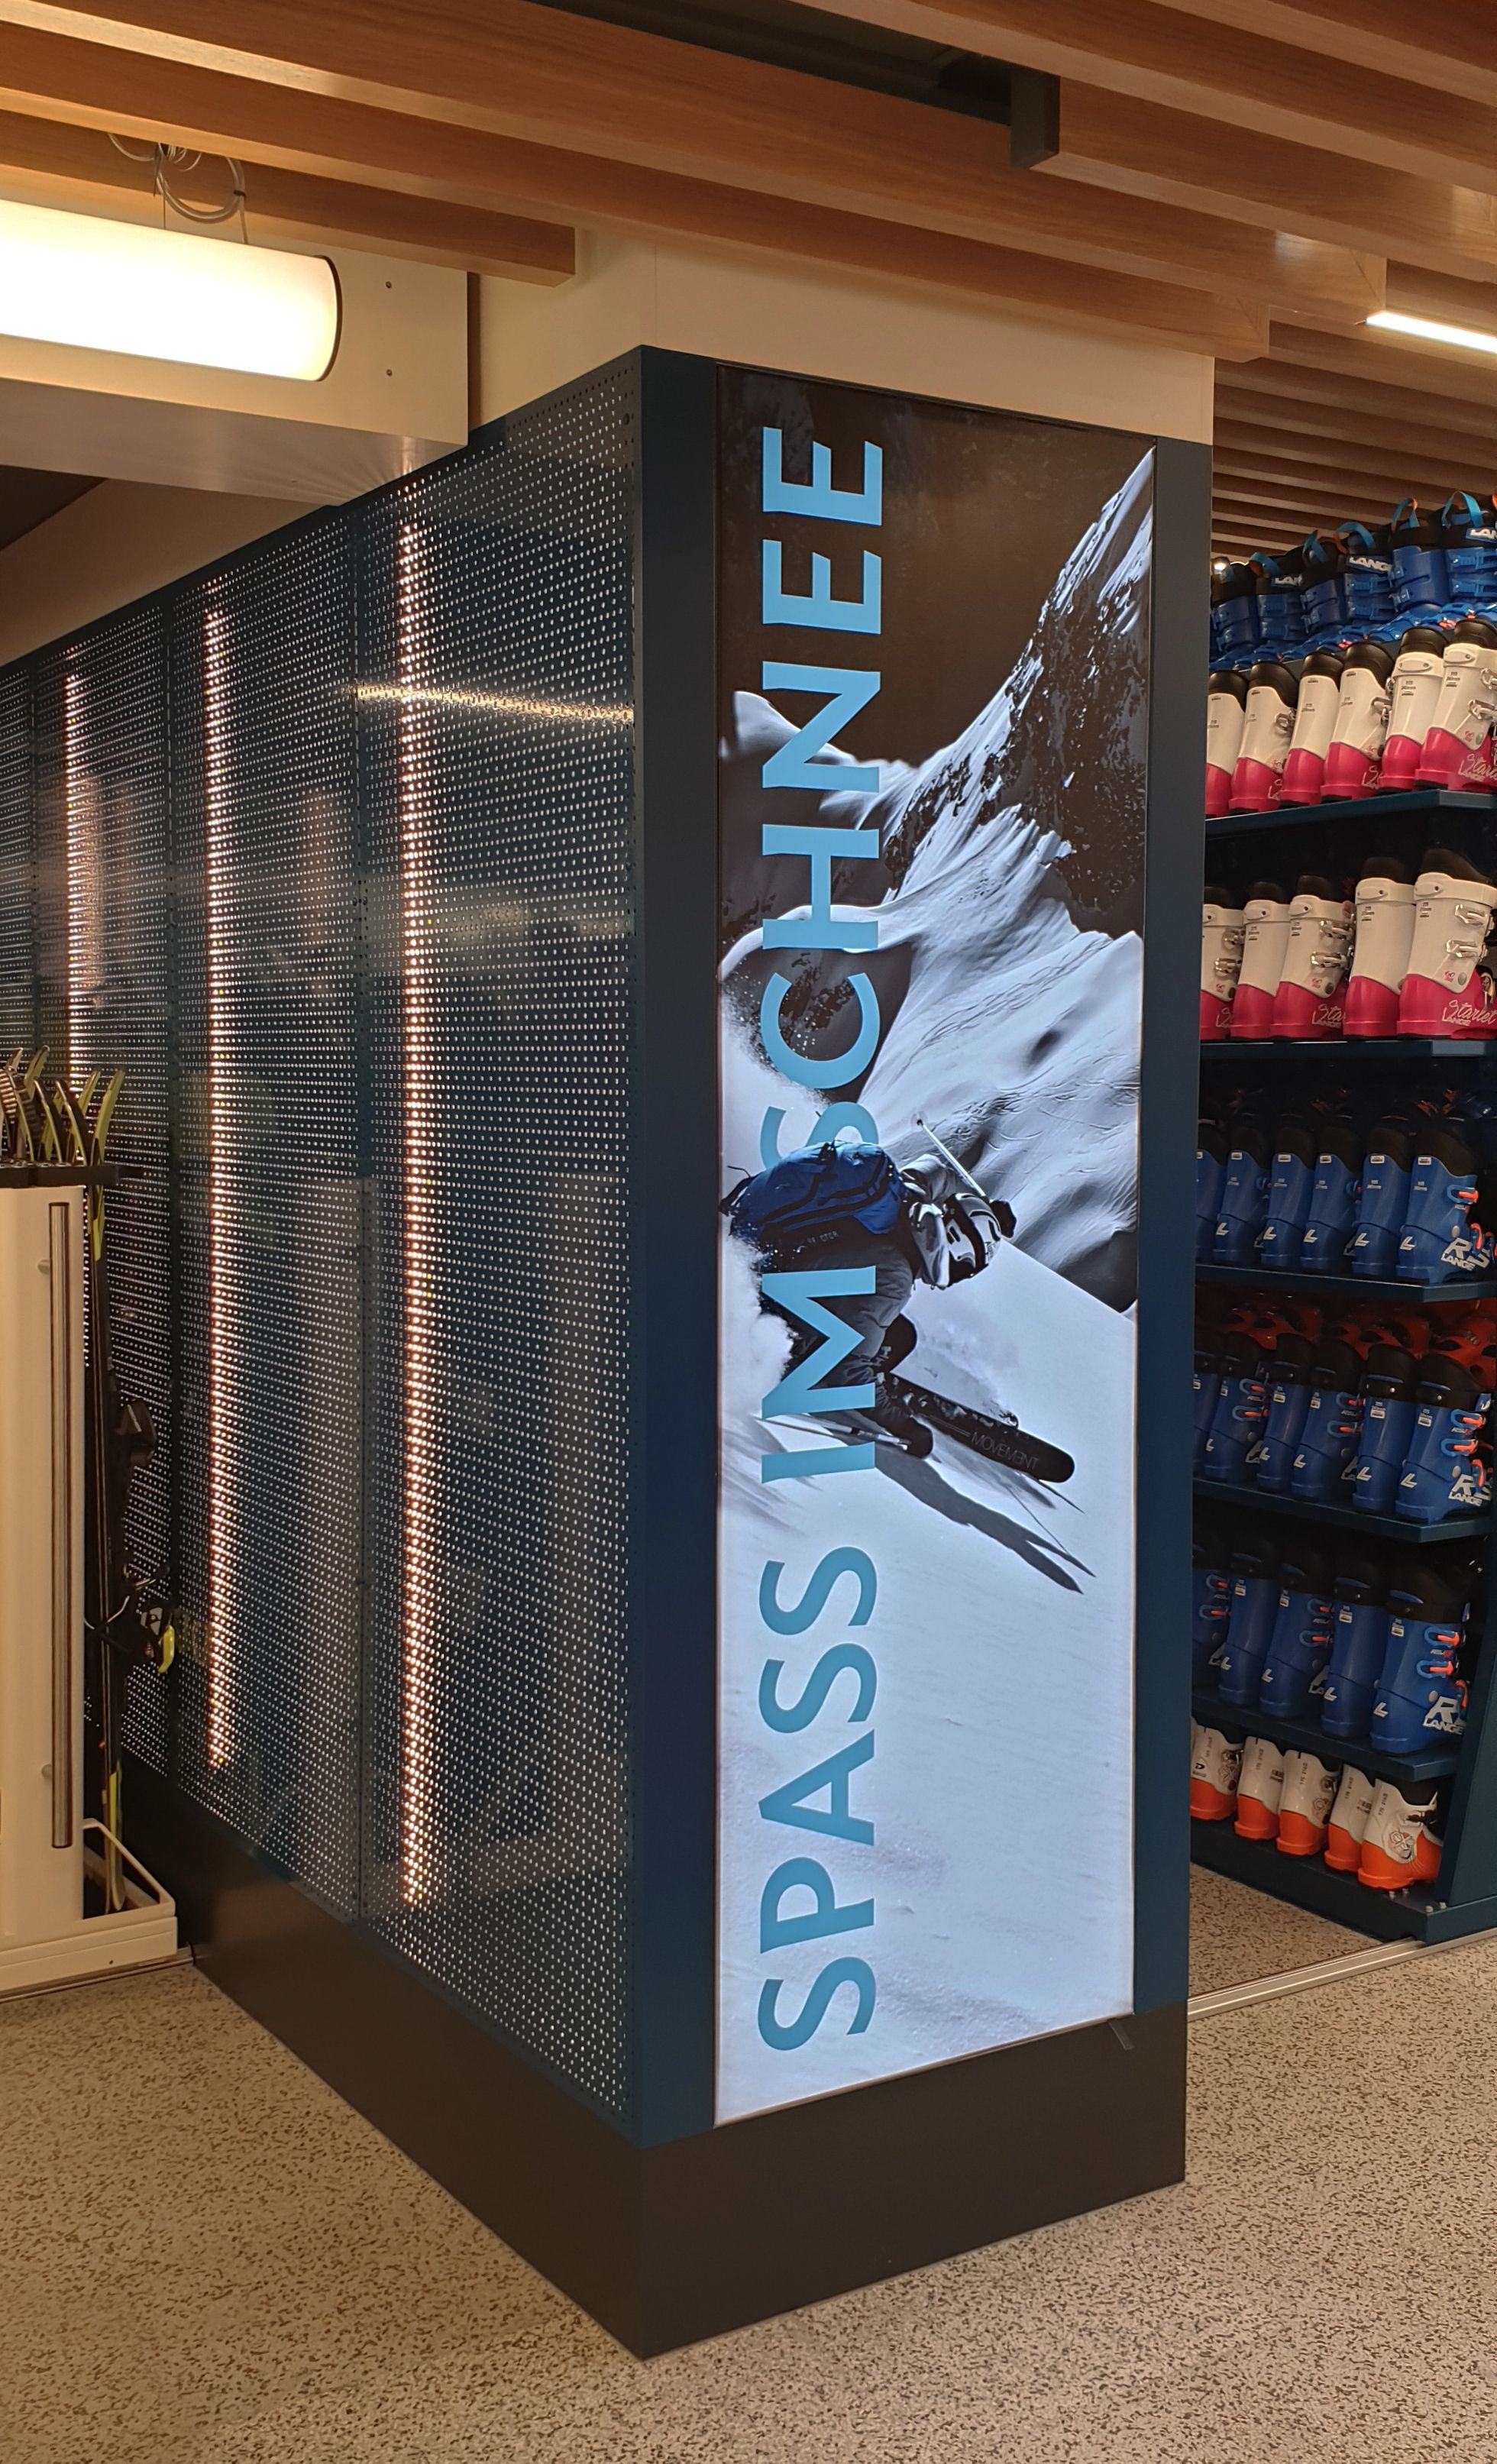 Strolz Rent a Ski Armellini Ladenbau Sportgeschäft